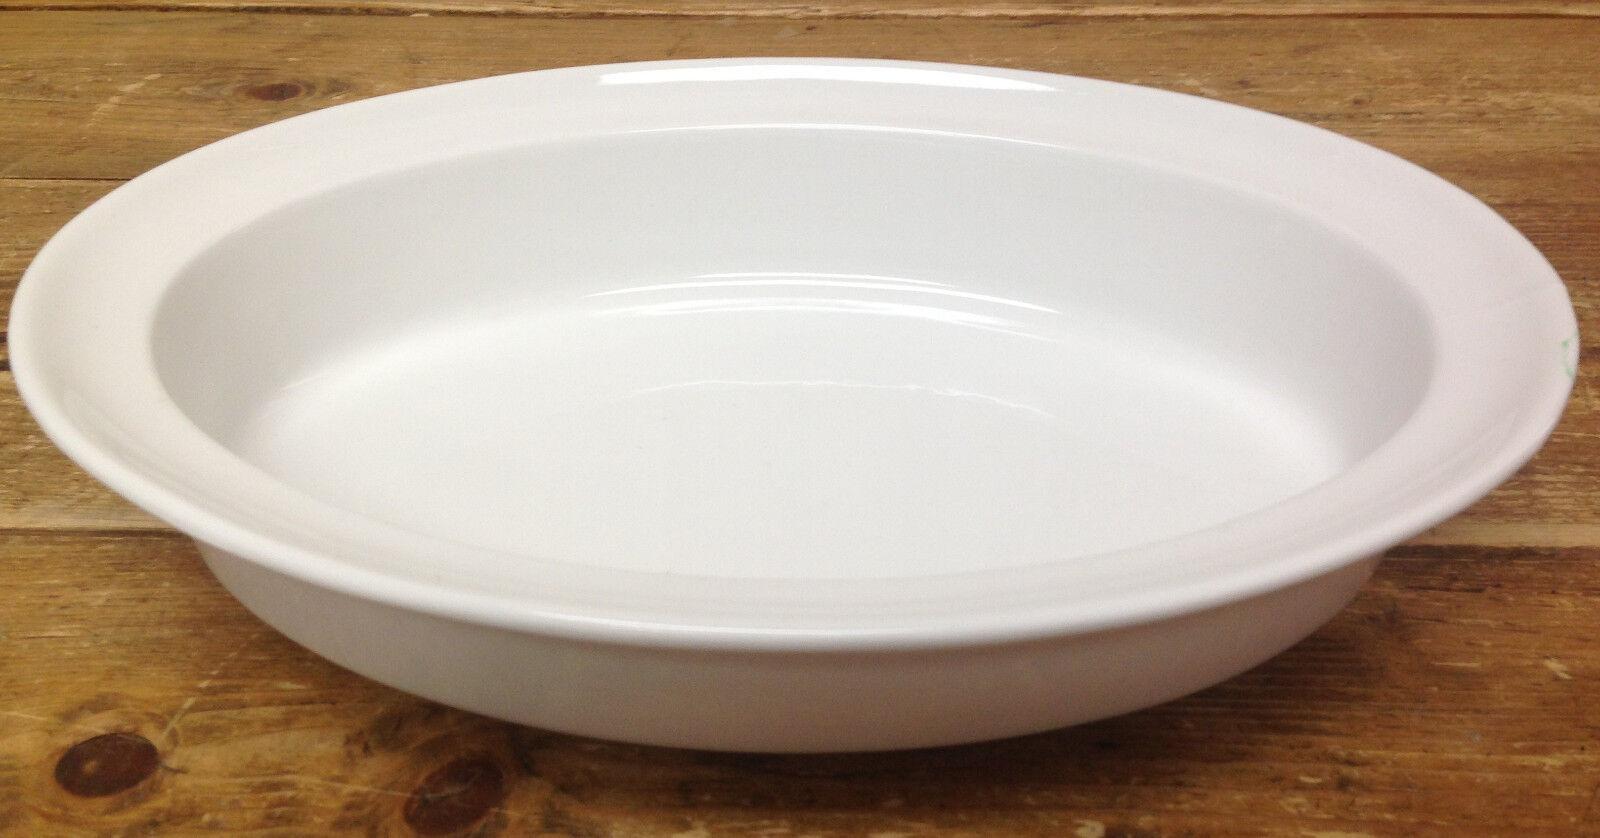 Crate & Barrel Grand Porcelaine Blanc Ovale Cuiseur 658-367 Bord 13 1 4 Cuisson